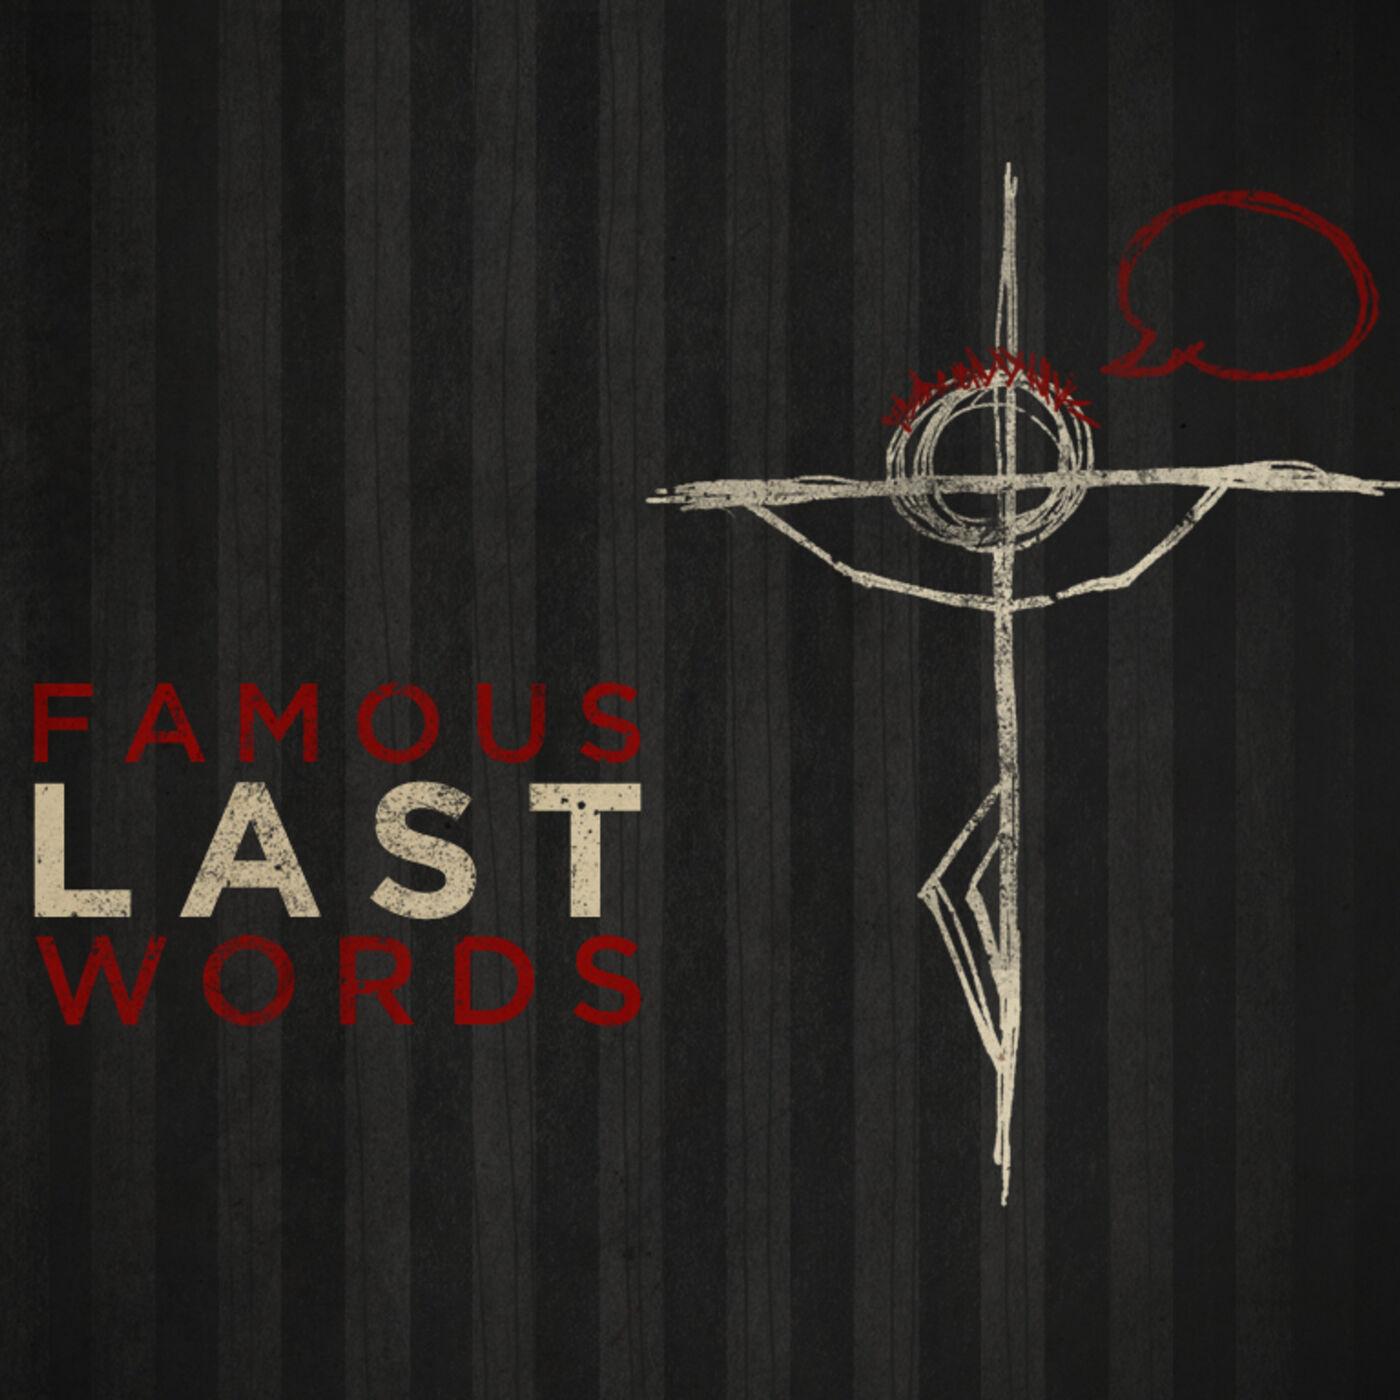 Famous Last Words - Week 1